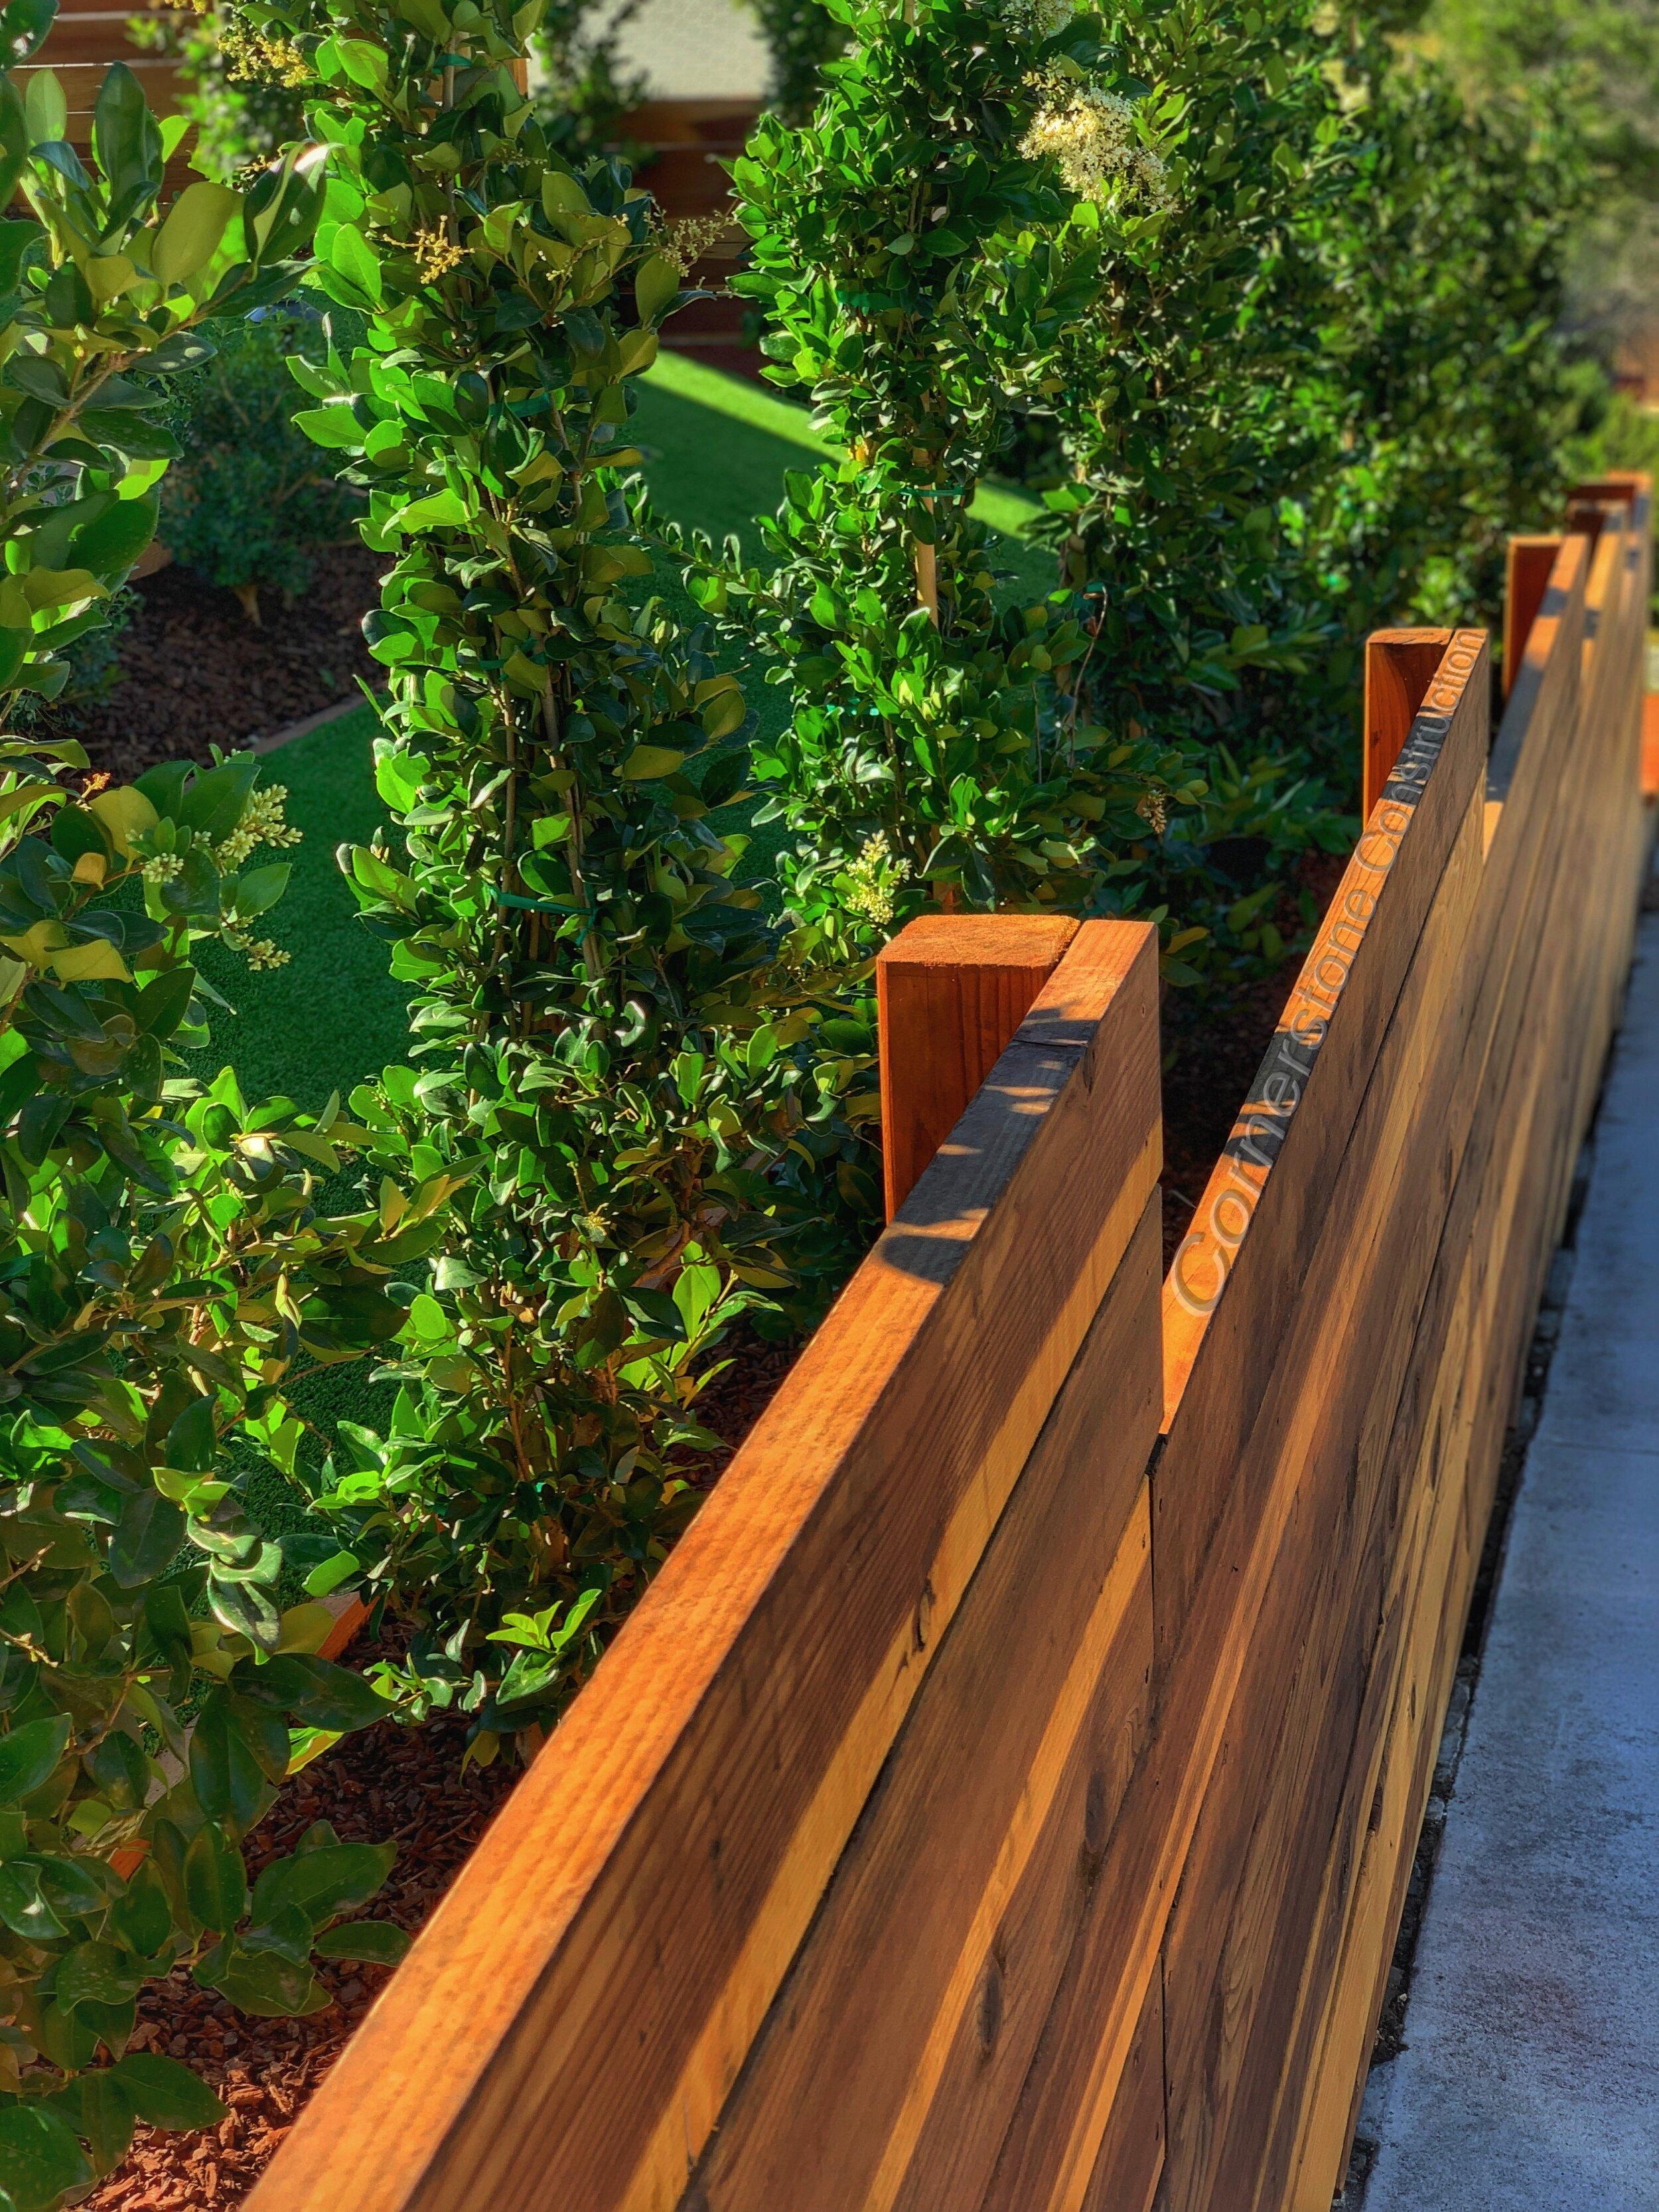 redwood fence in backyard